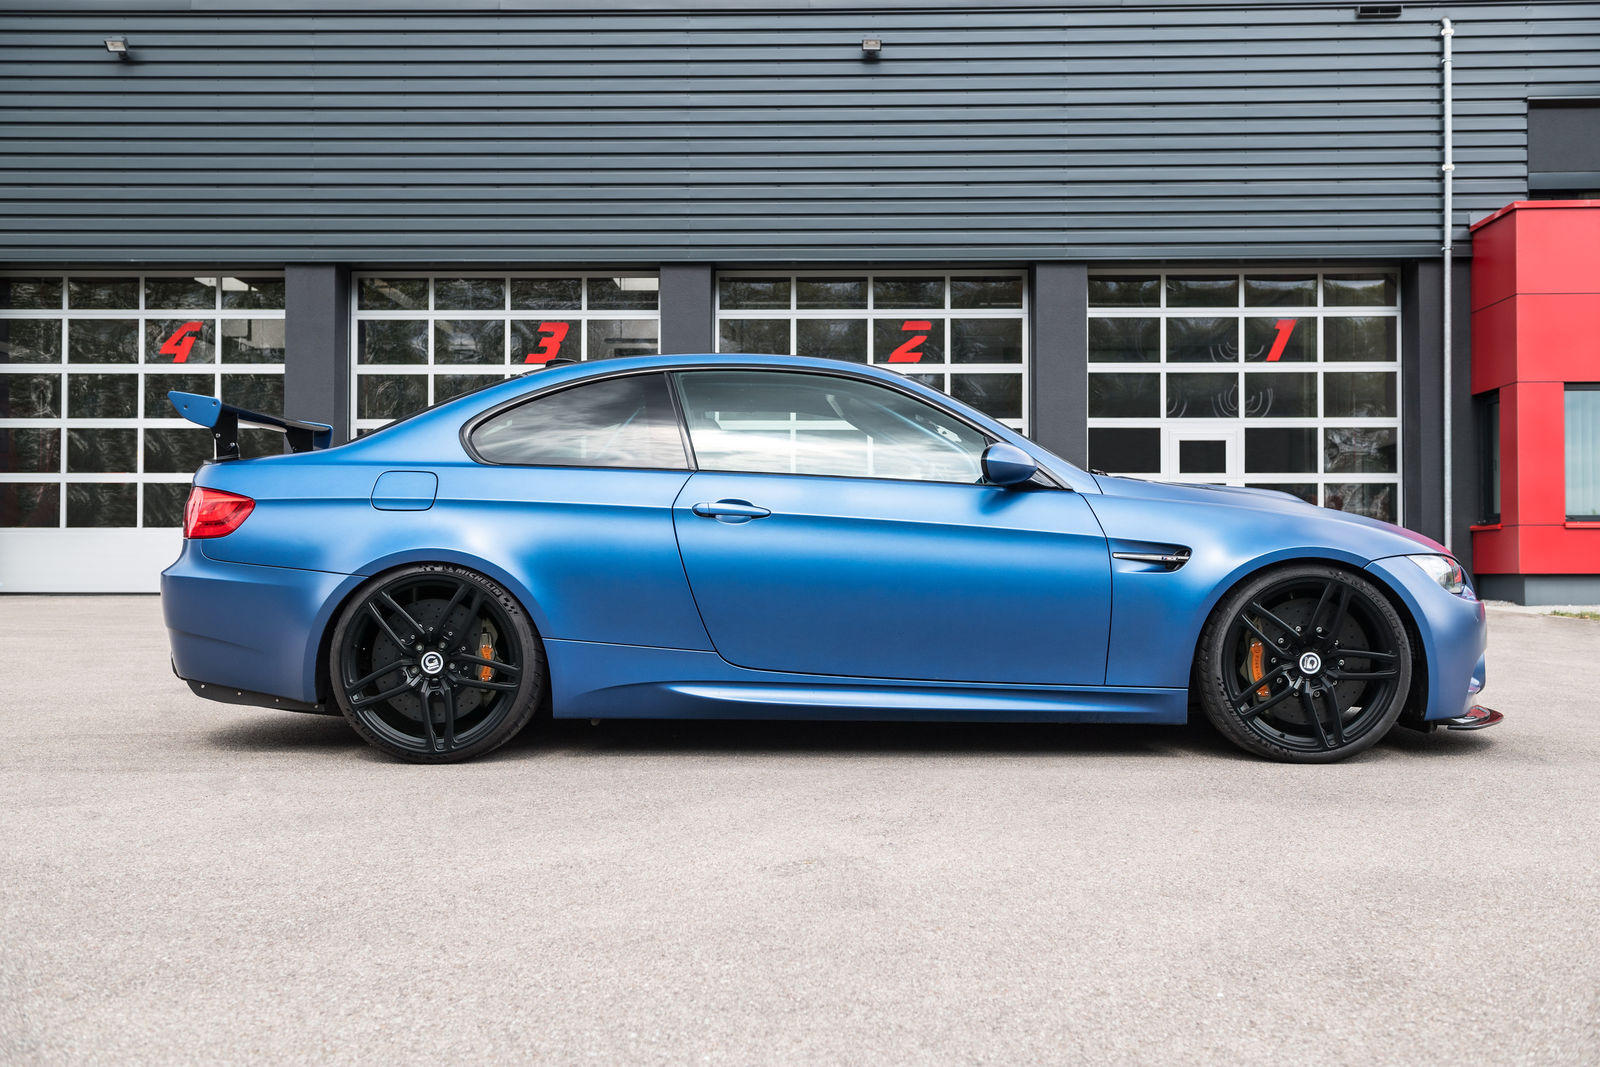 BMW M3 by G-Power - BMW M3 by G-Power